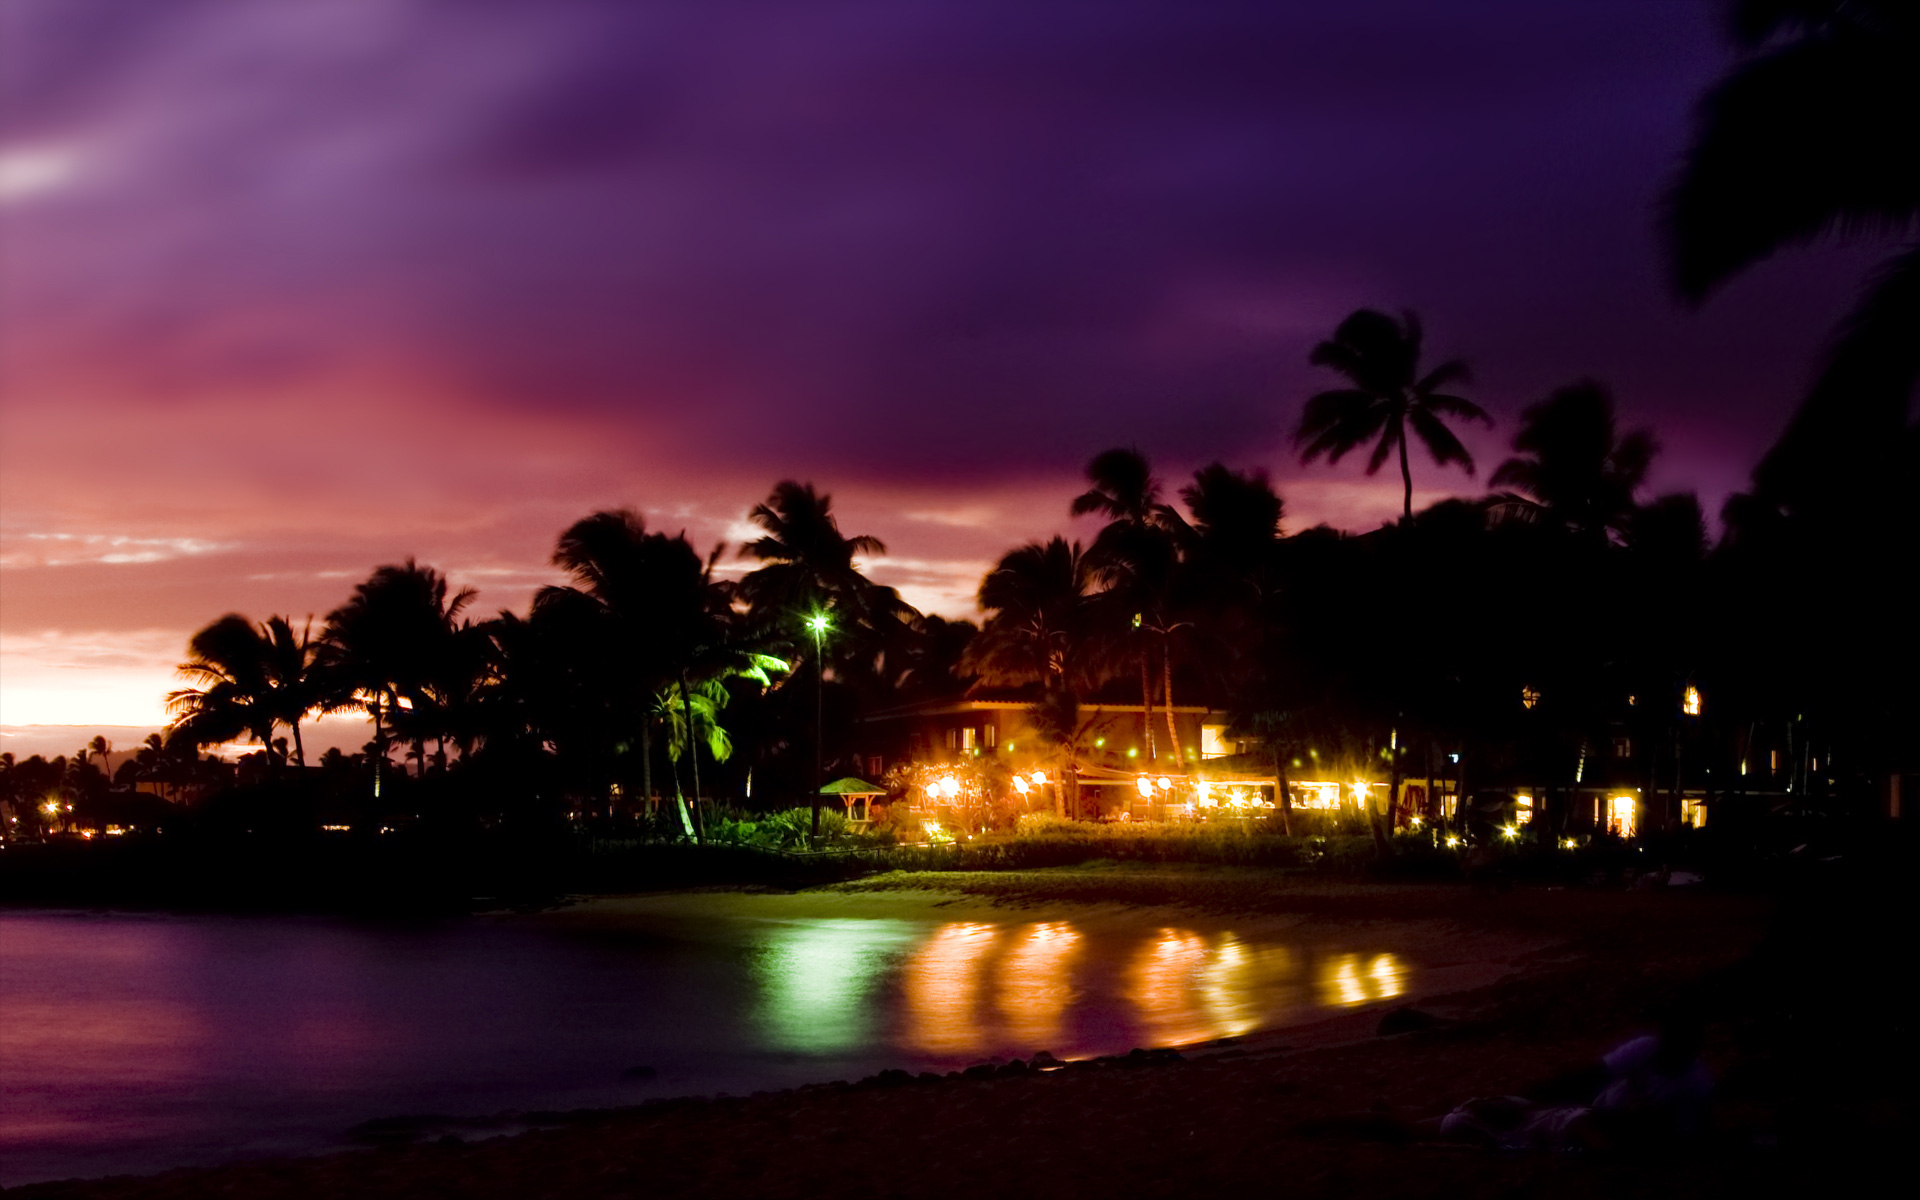 Hawaii Sunset Wallpaper, wallpaper, Hawaii Sunset Wallpaper hd ...